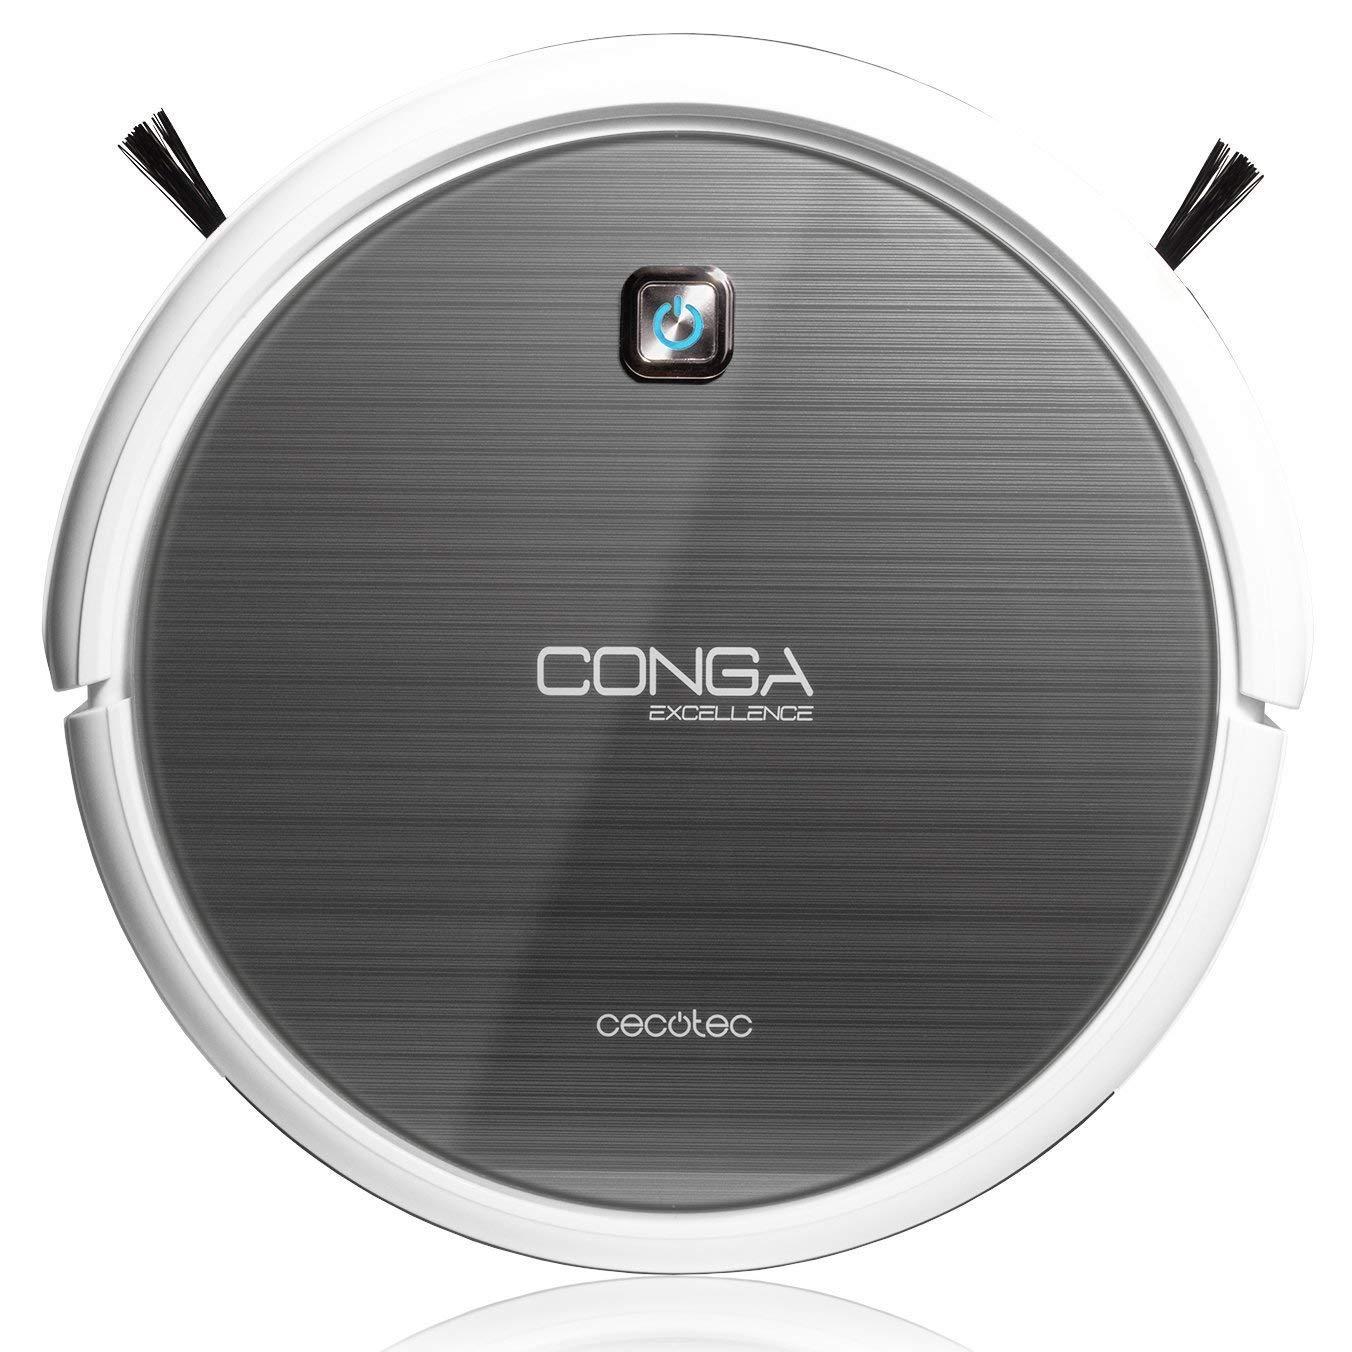 Cecotec Conga Excellence - Robot aspirador (4 en 1, barre, aspira, pasa la mopa y friega el suelo, silencioso, programable)